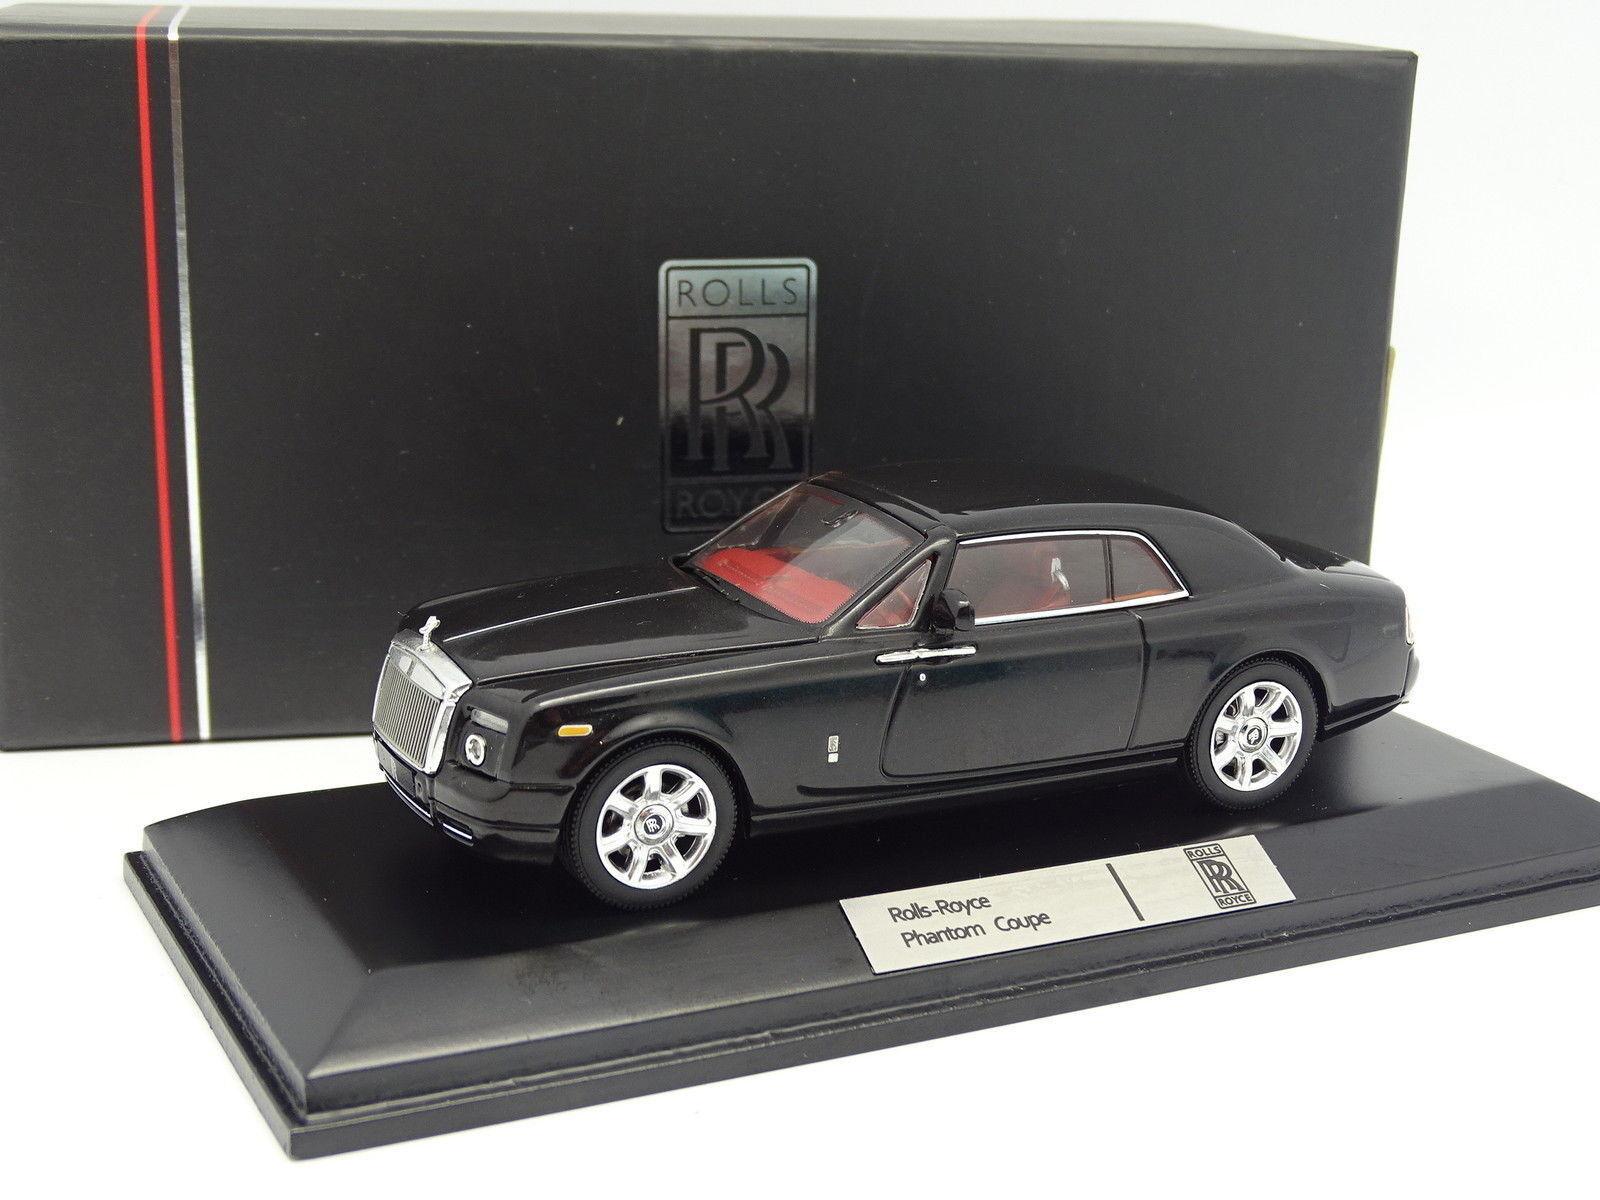 Ixo 1 43 - Rolls Royce Phantom Coupe Noire